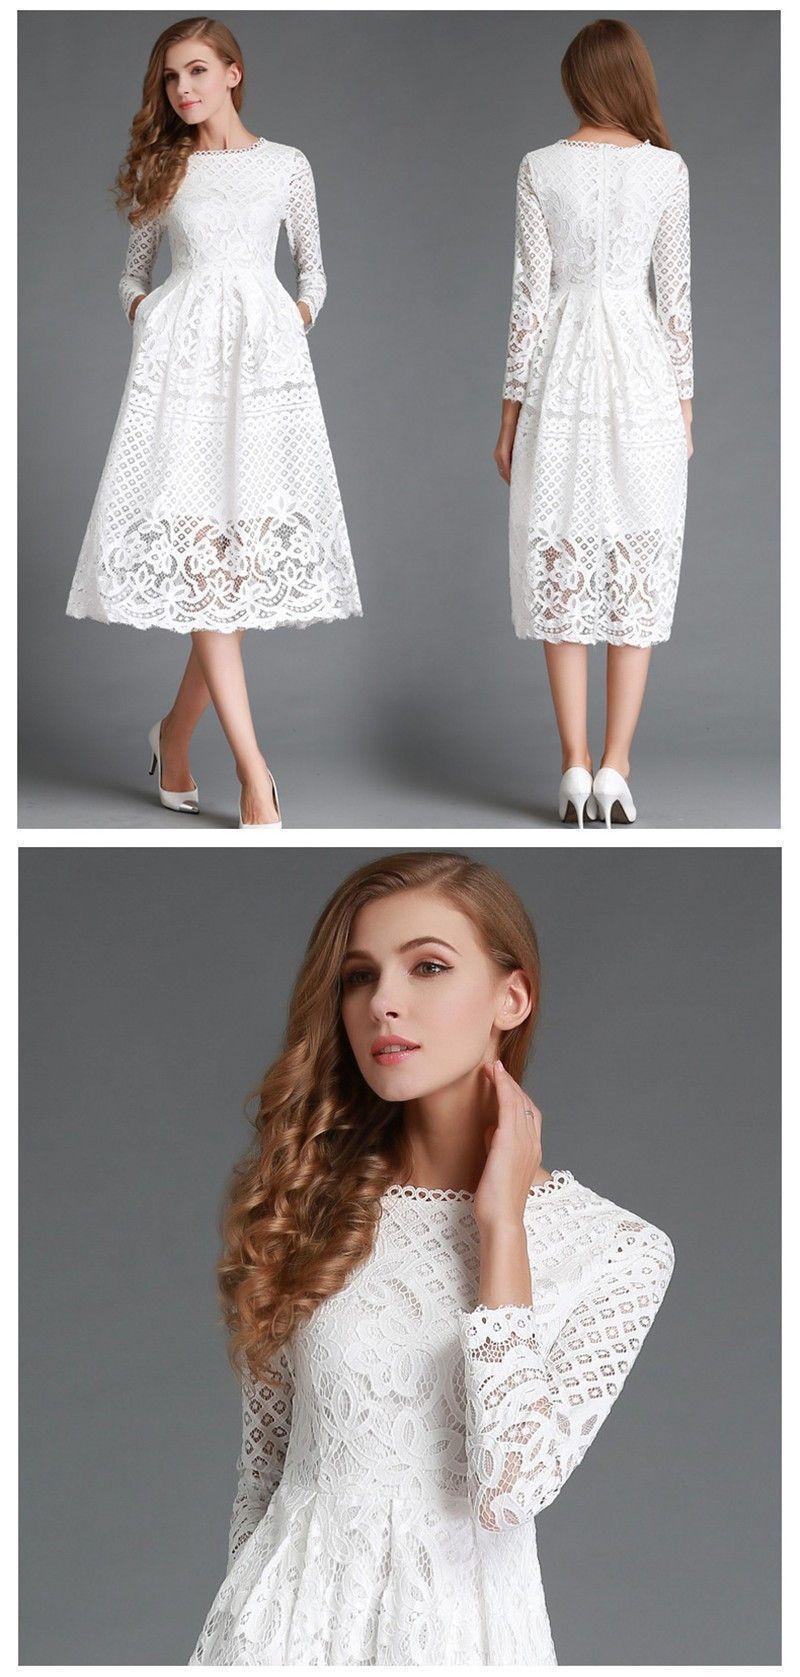 Waistline empire decoration hollow out material lace dresses